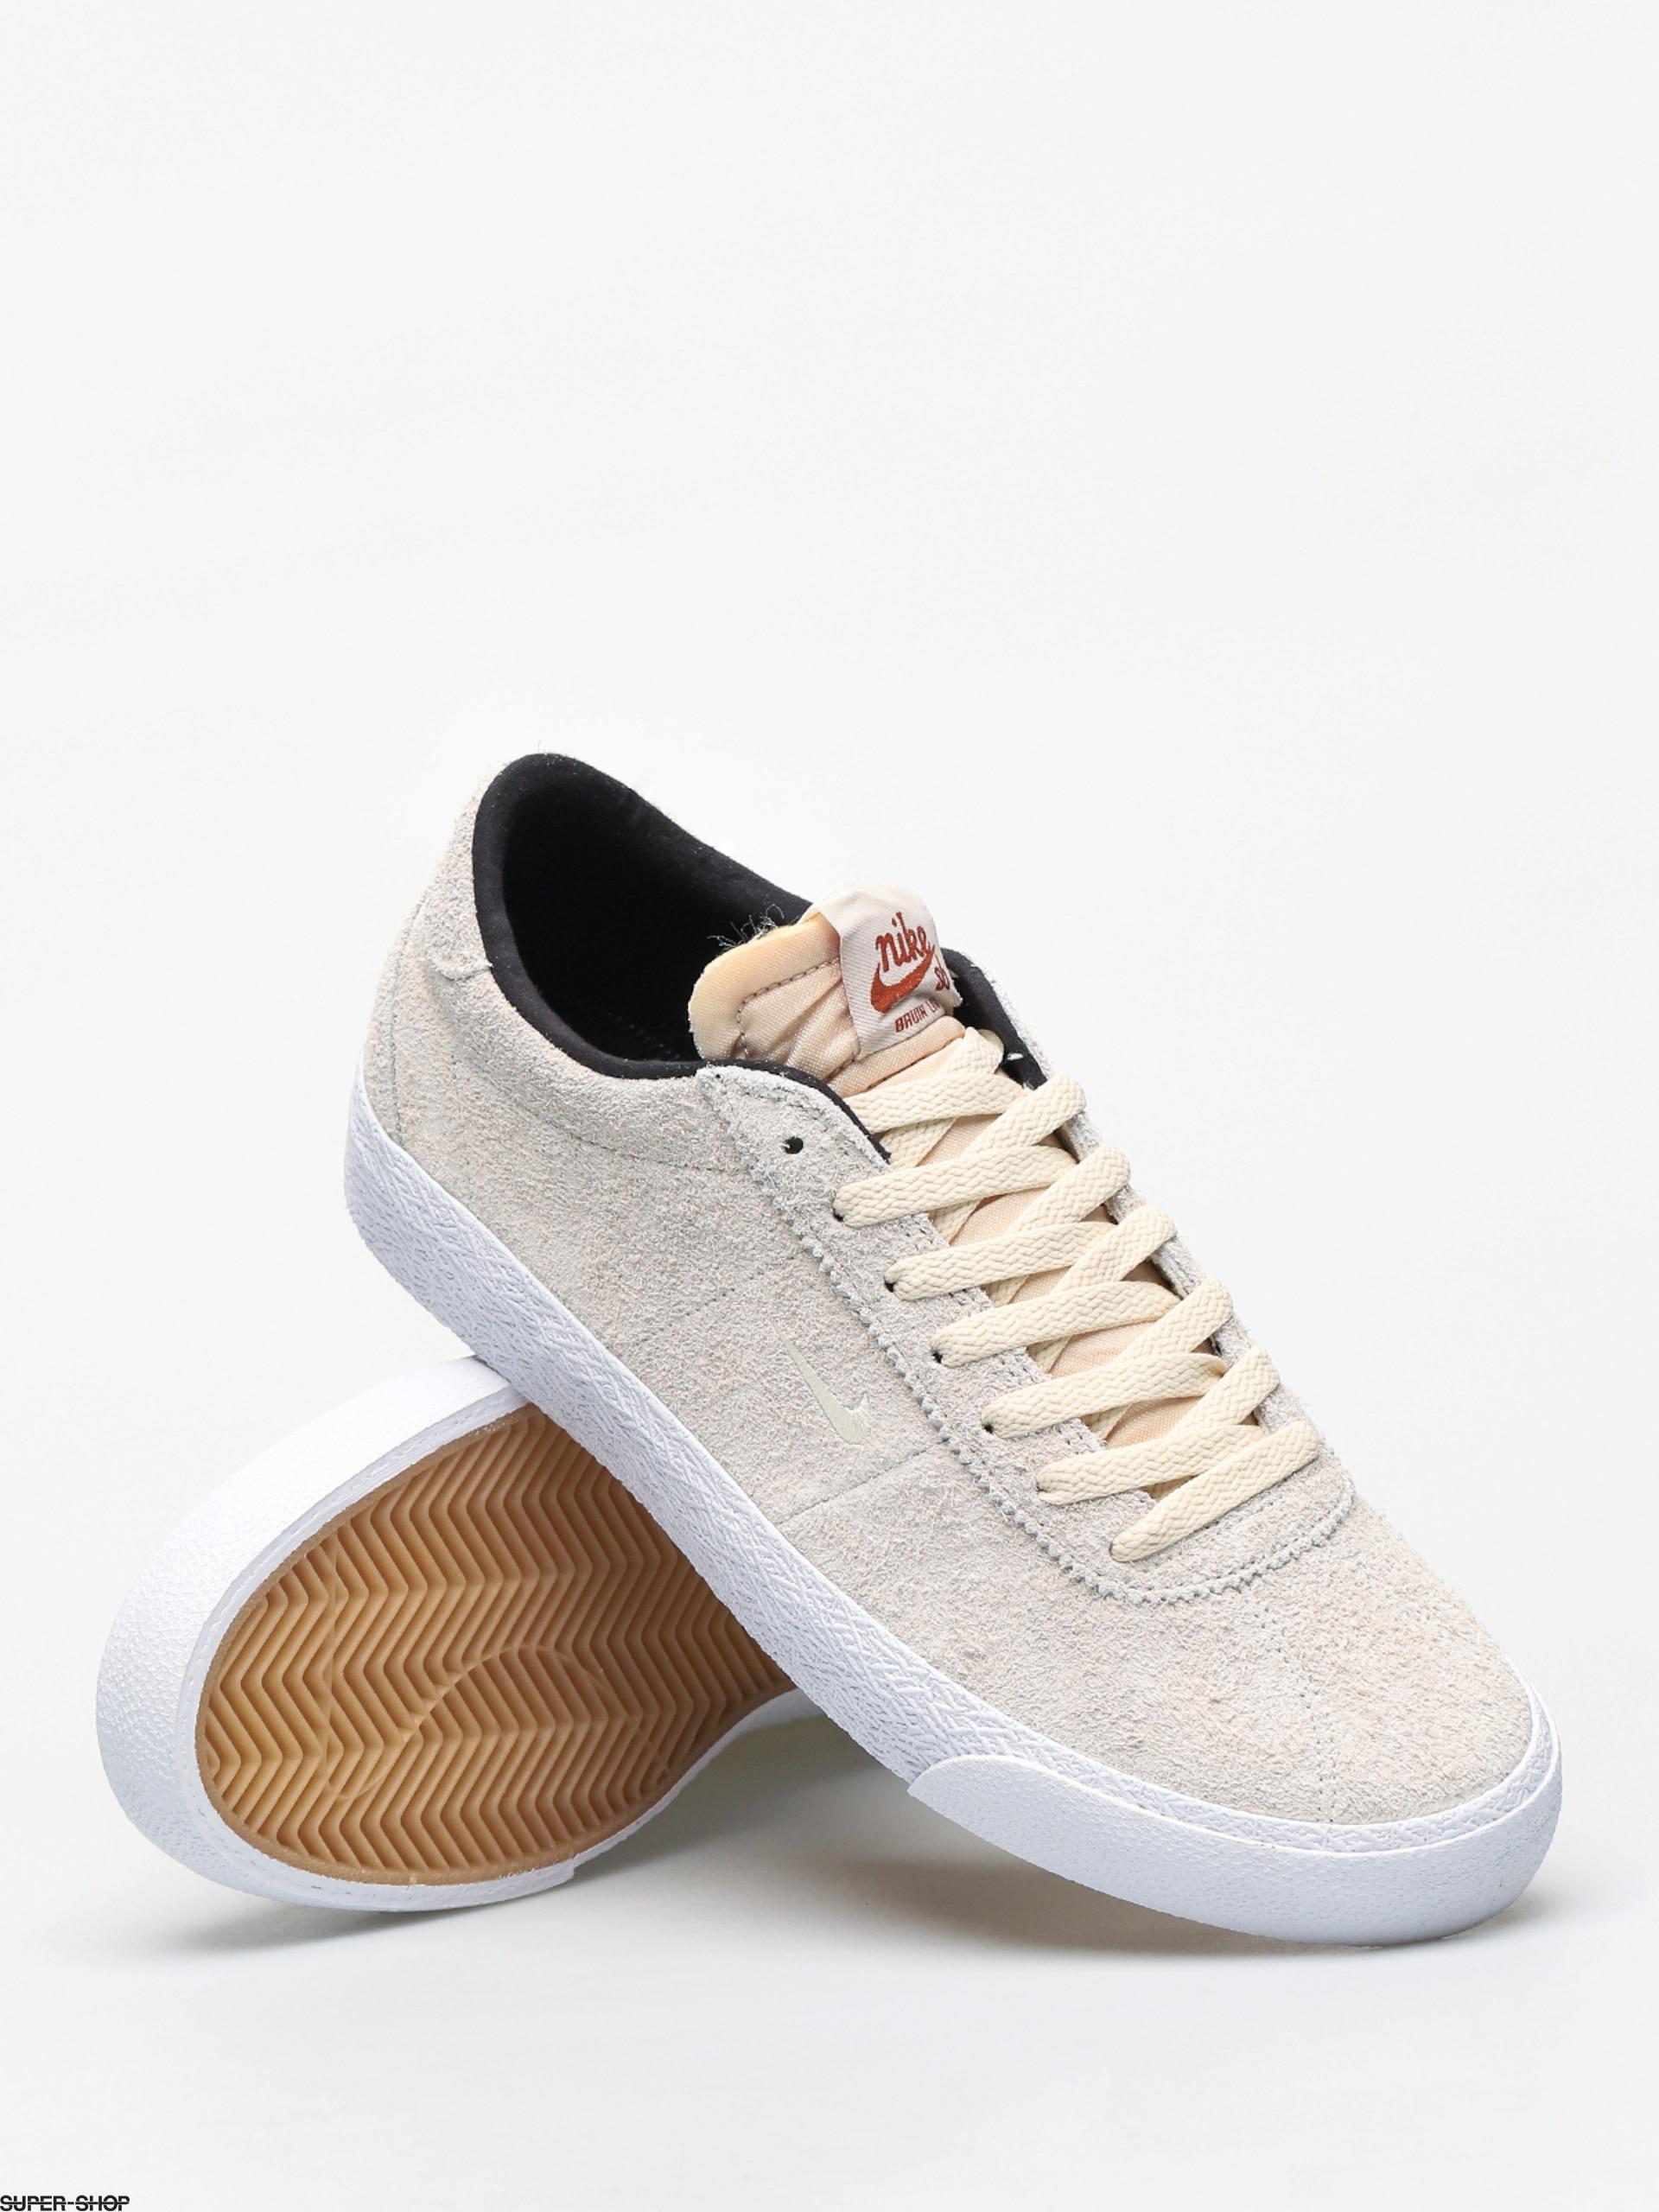 online store 48c57 e8c5c Nike SB Zoom Bruin Ultra Shoes (light cream/light cream black gum yellow)